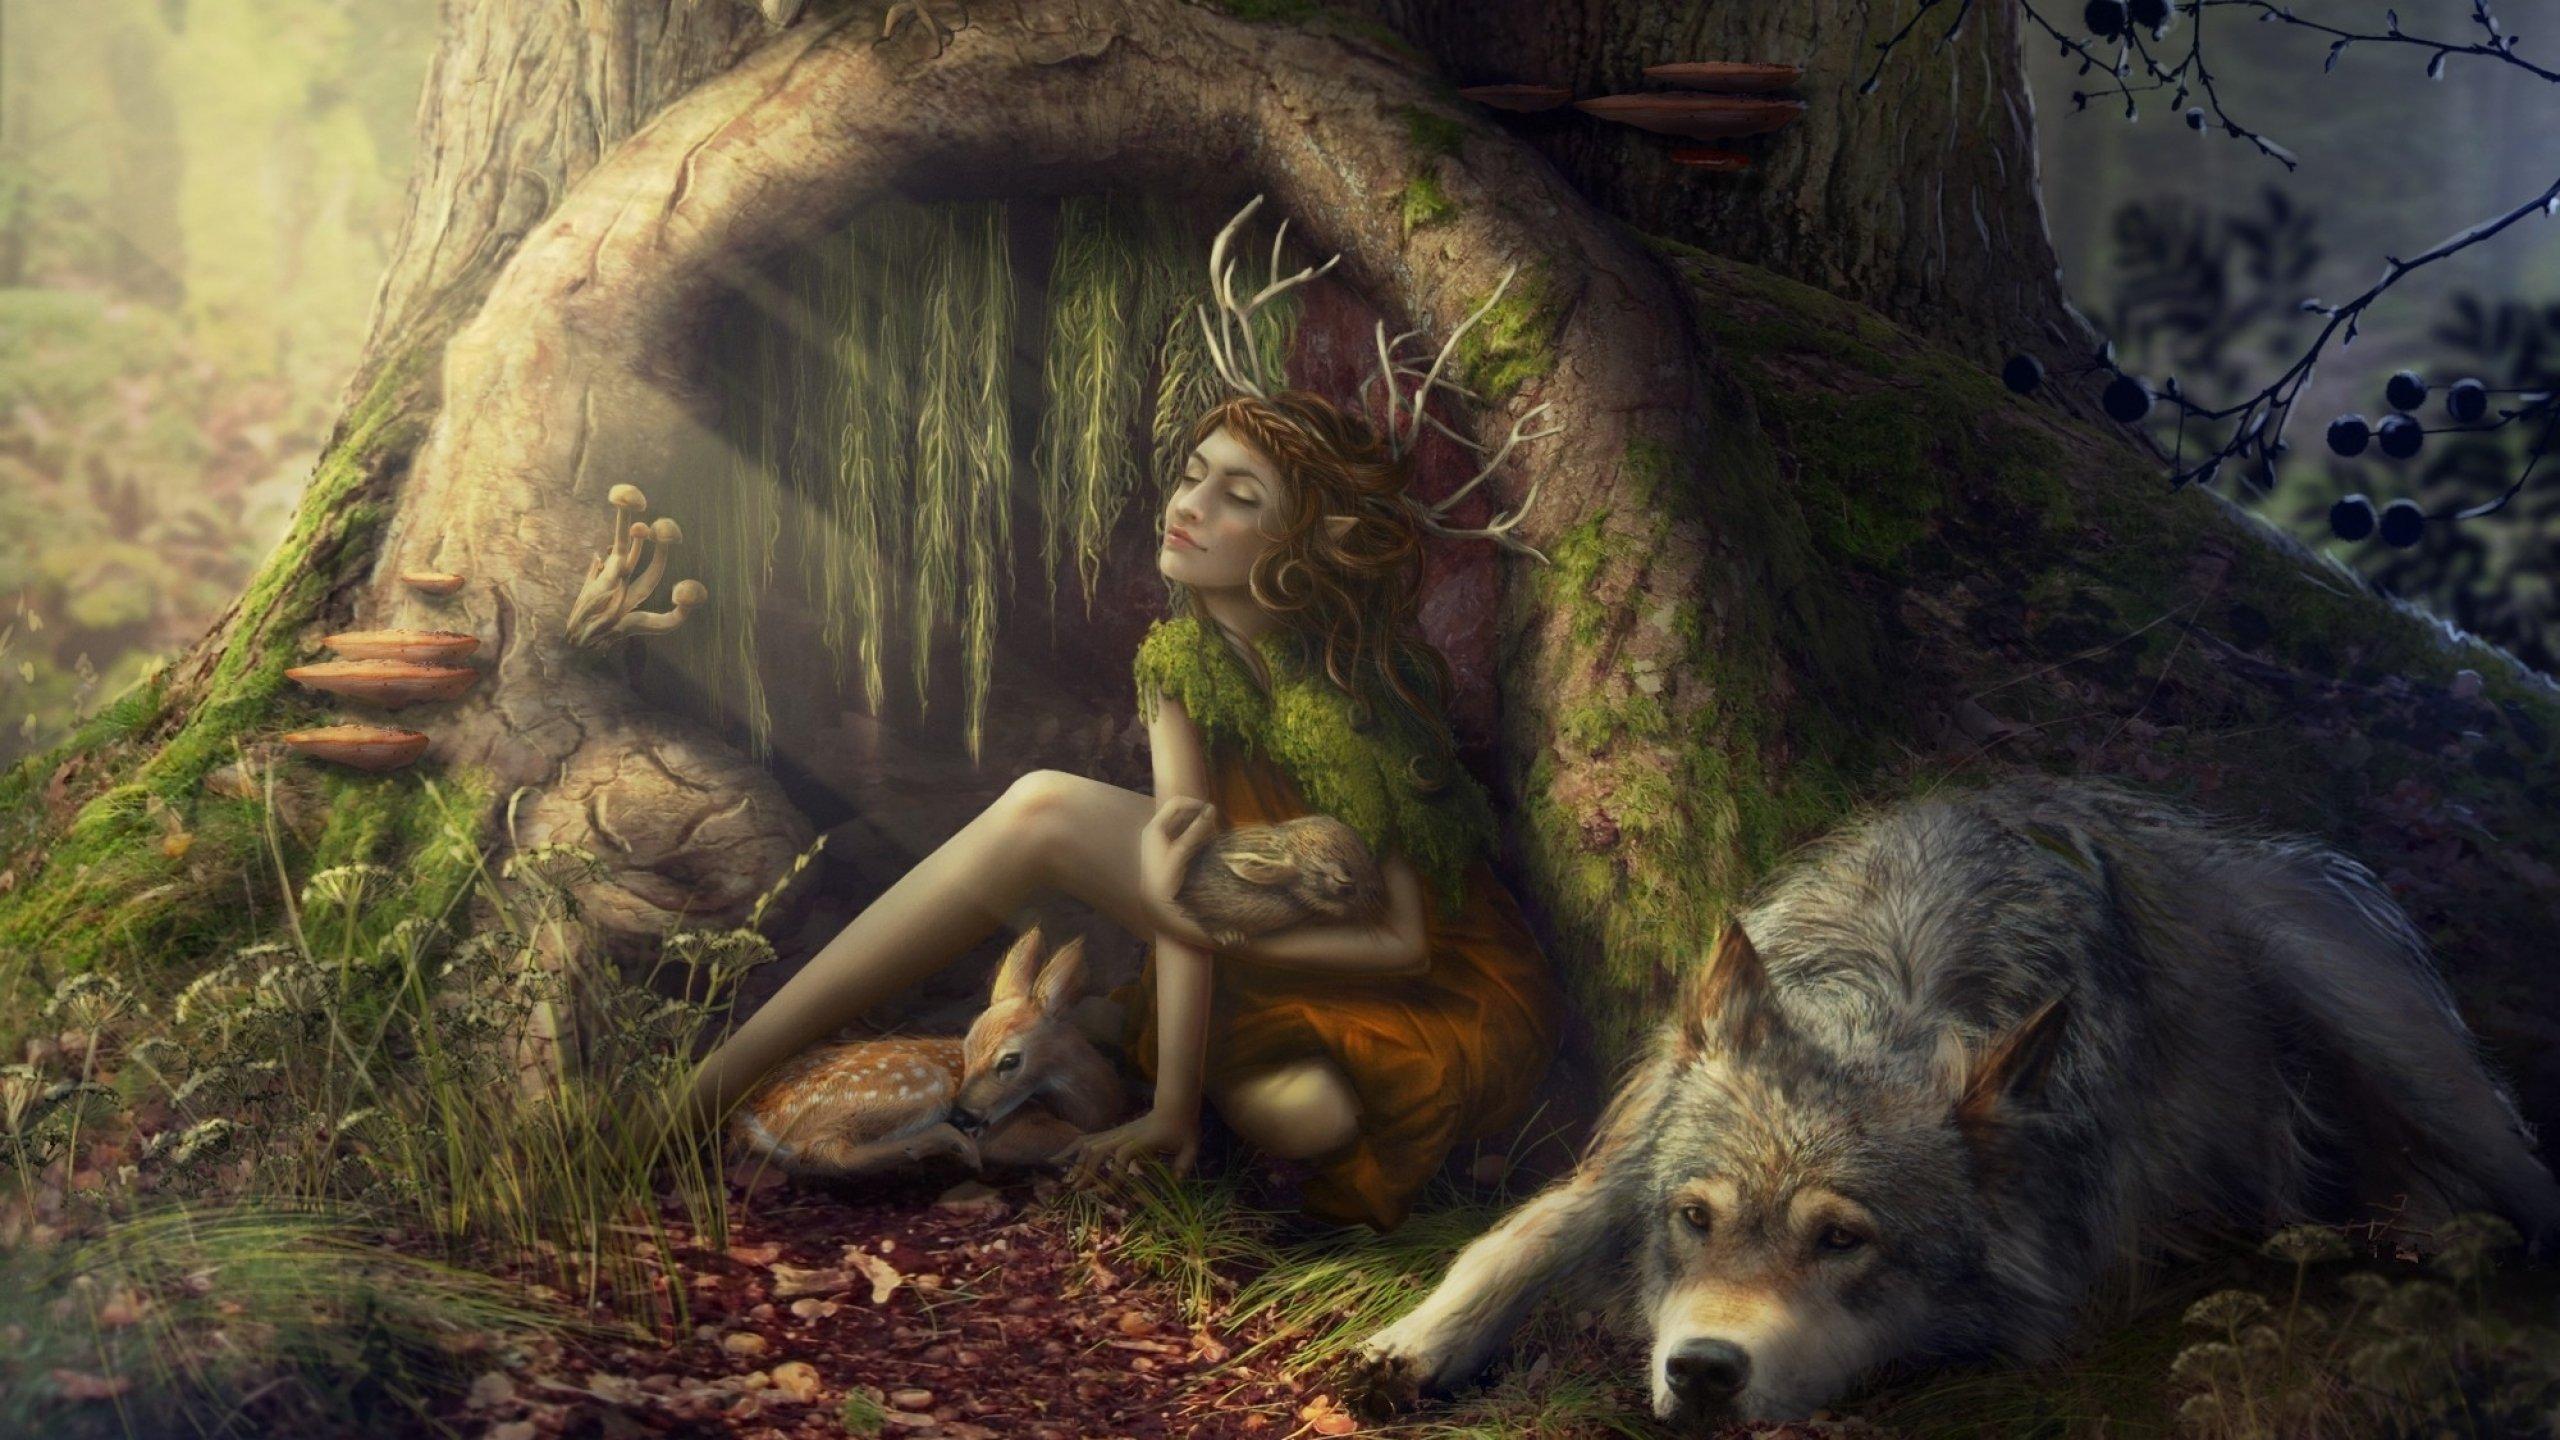 Art artwork fantasy magical forest original magic creature f wallpaper | 2560x1440 | 697754 | WallpaperUP